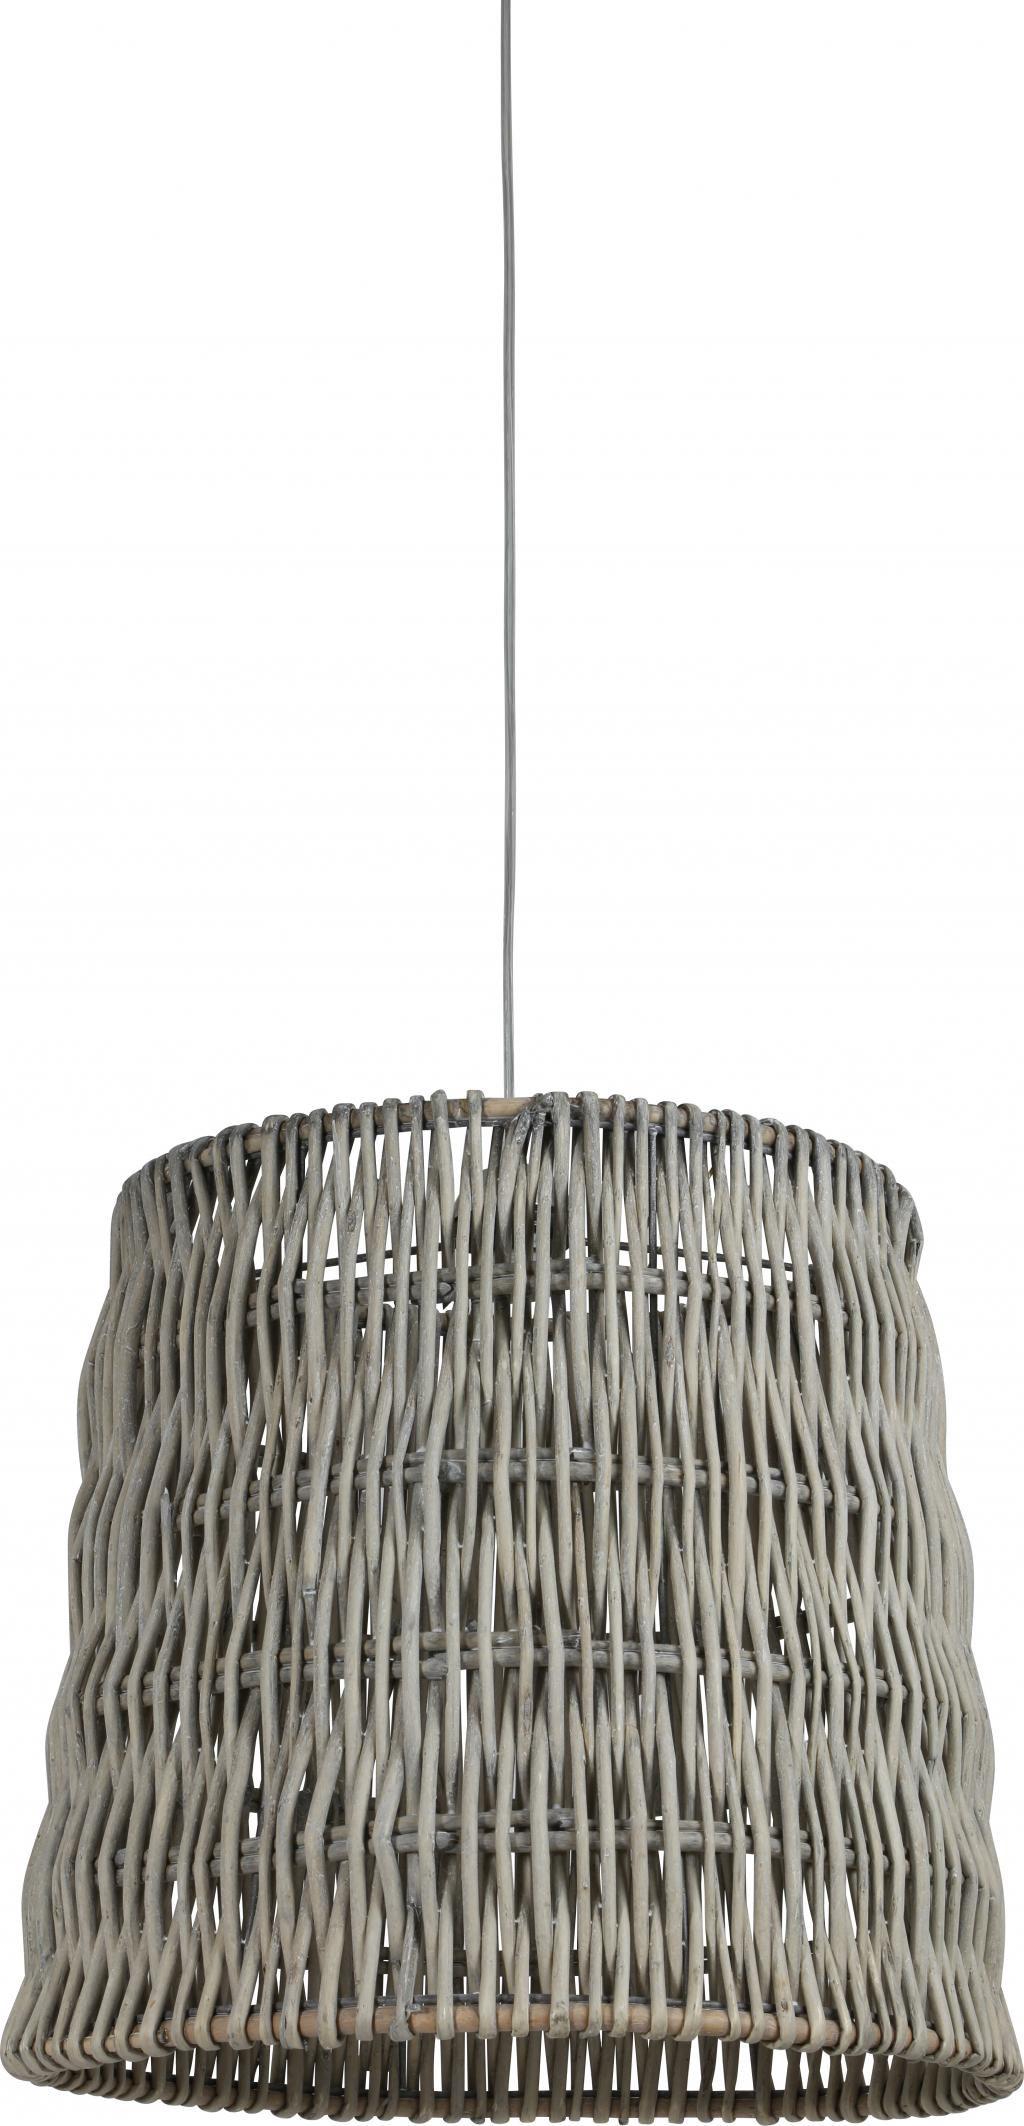 hanglamp-rotan---drum---vertical-weaving---grijs---recht---light-and-living[3].jpg